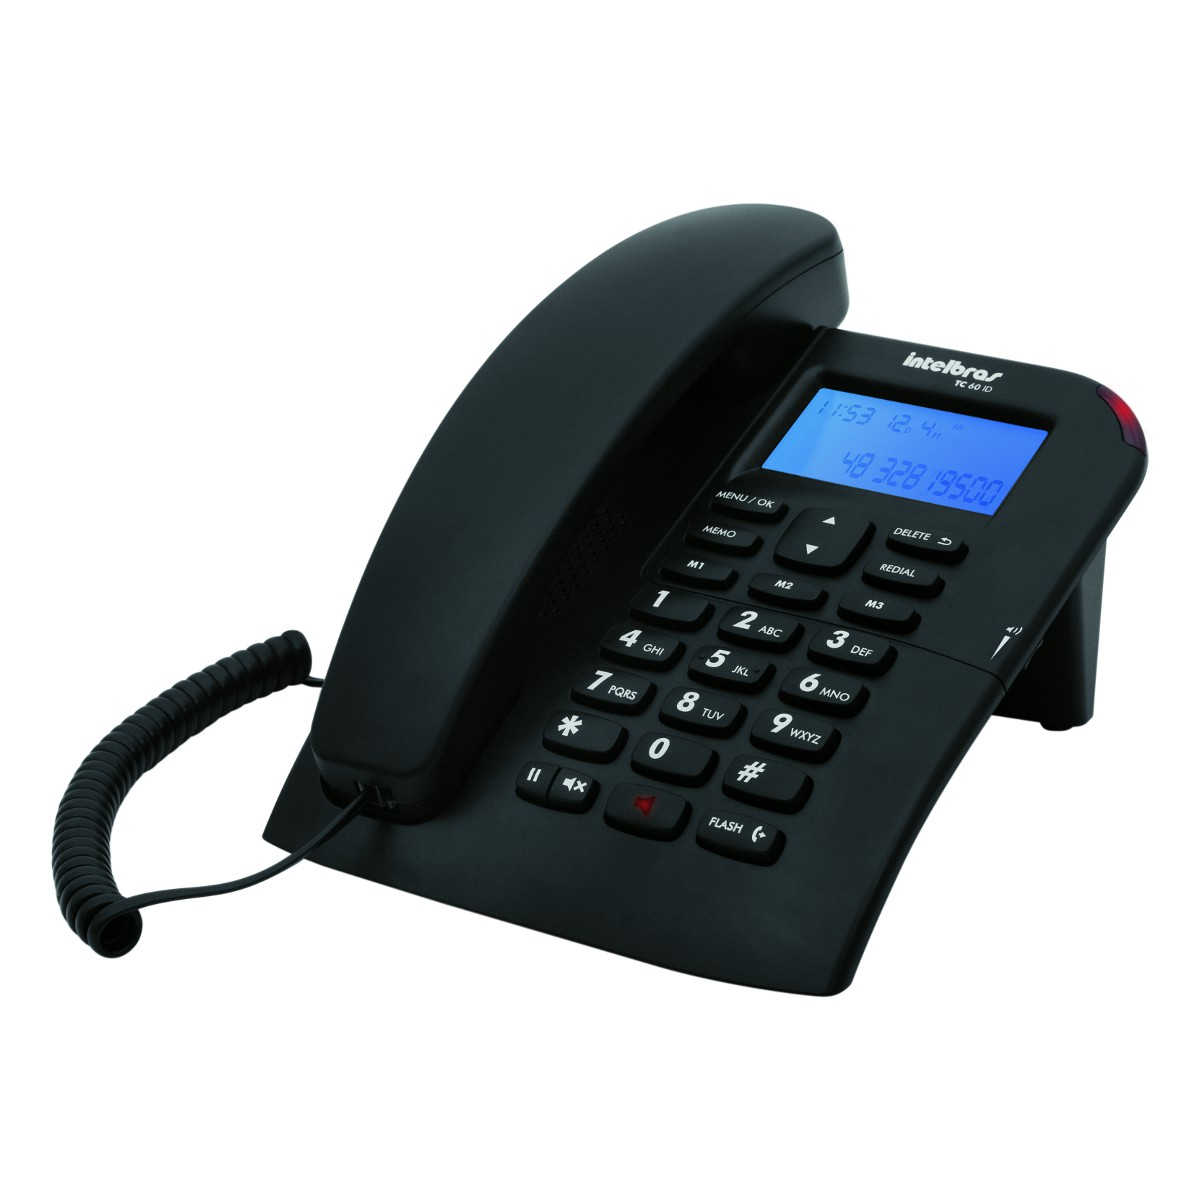 Telefone com Fio TC 60 ID Preto - Intelbras